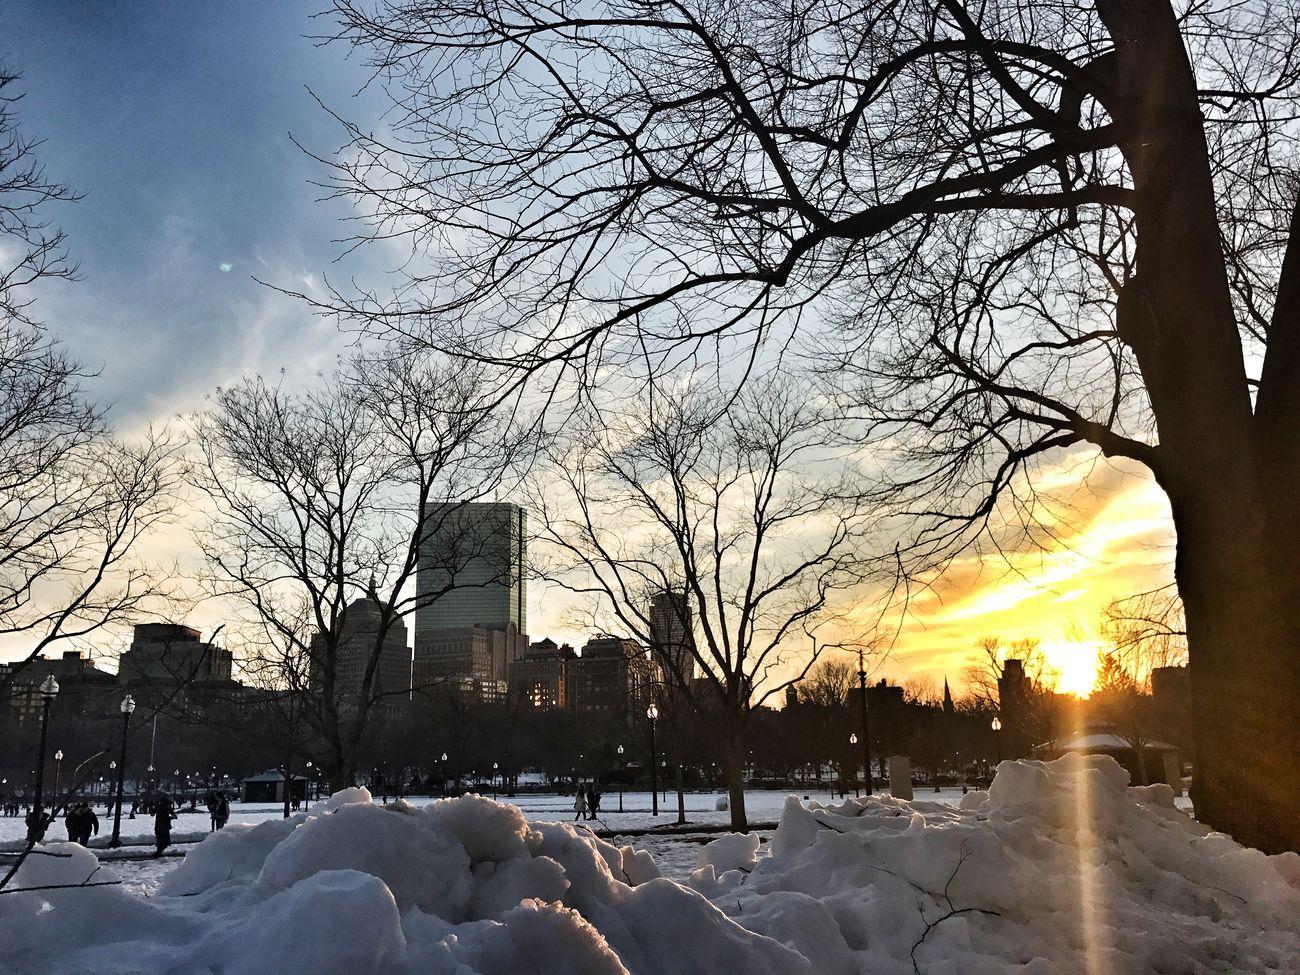 Boston Commons Snowy Sunset Park Winter Trees Winter Sky